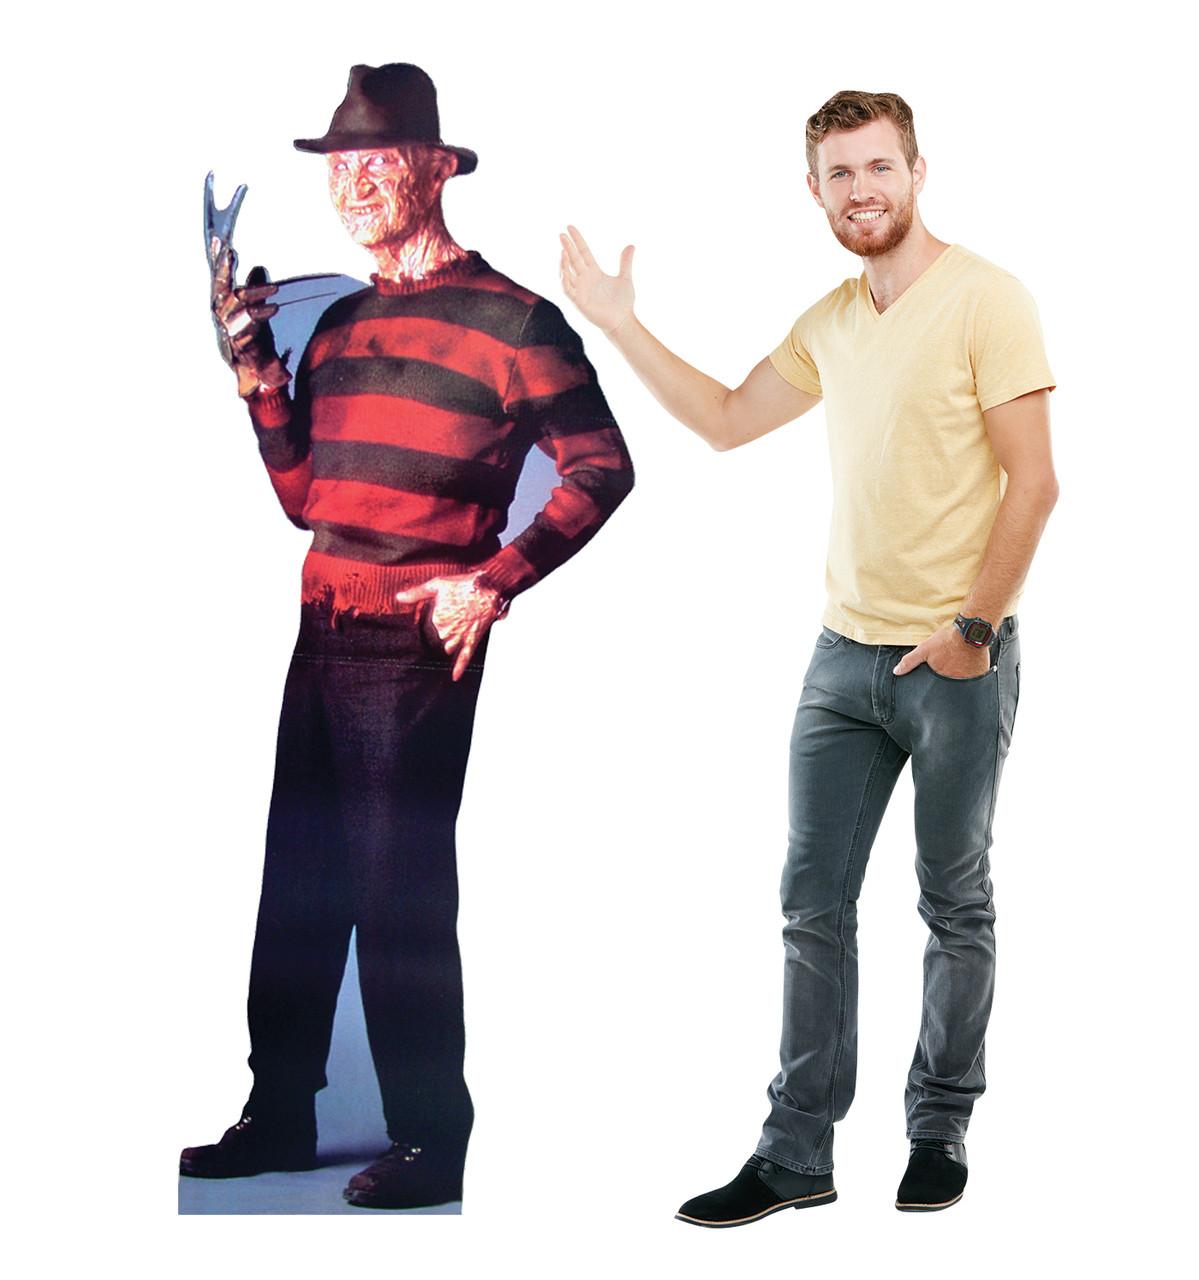 Life-size Freddy Krueger - Nightmare on Elm Street Cardboard Standup